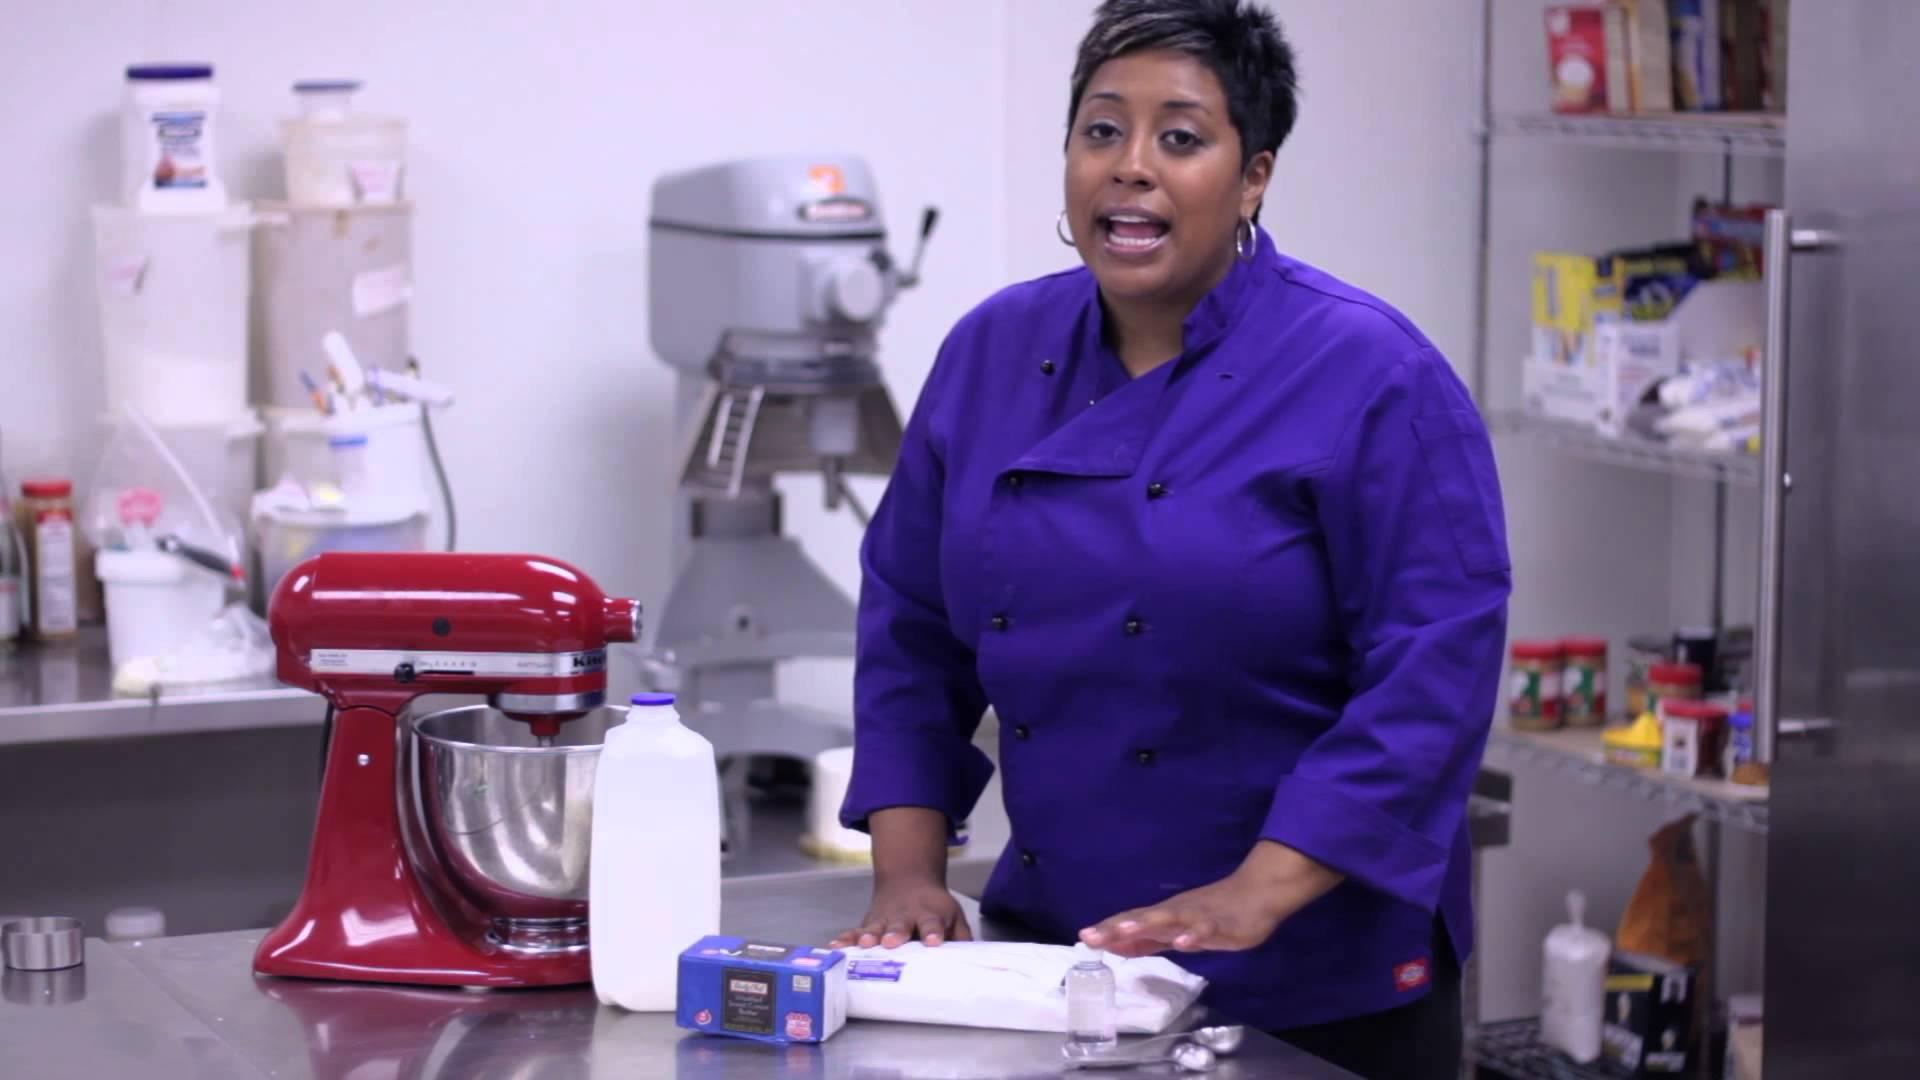 Wedding Cake Frosting Recipes : Take the Cake